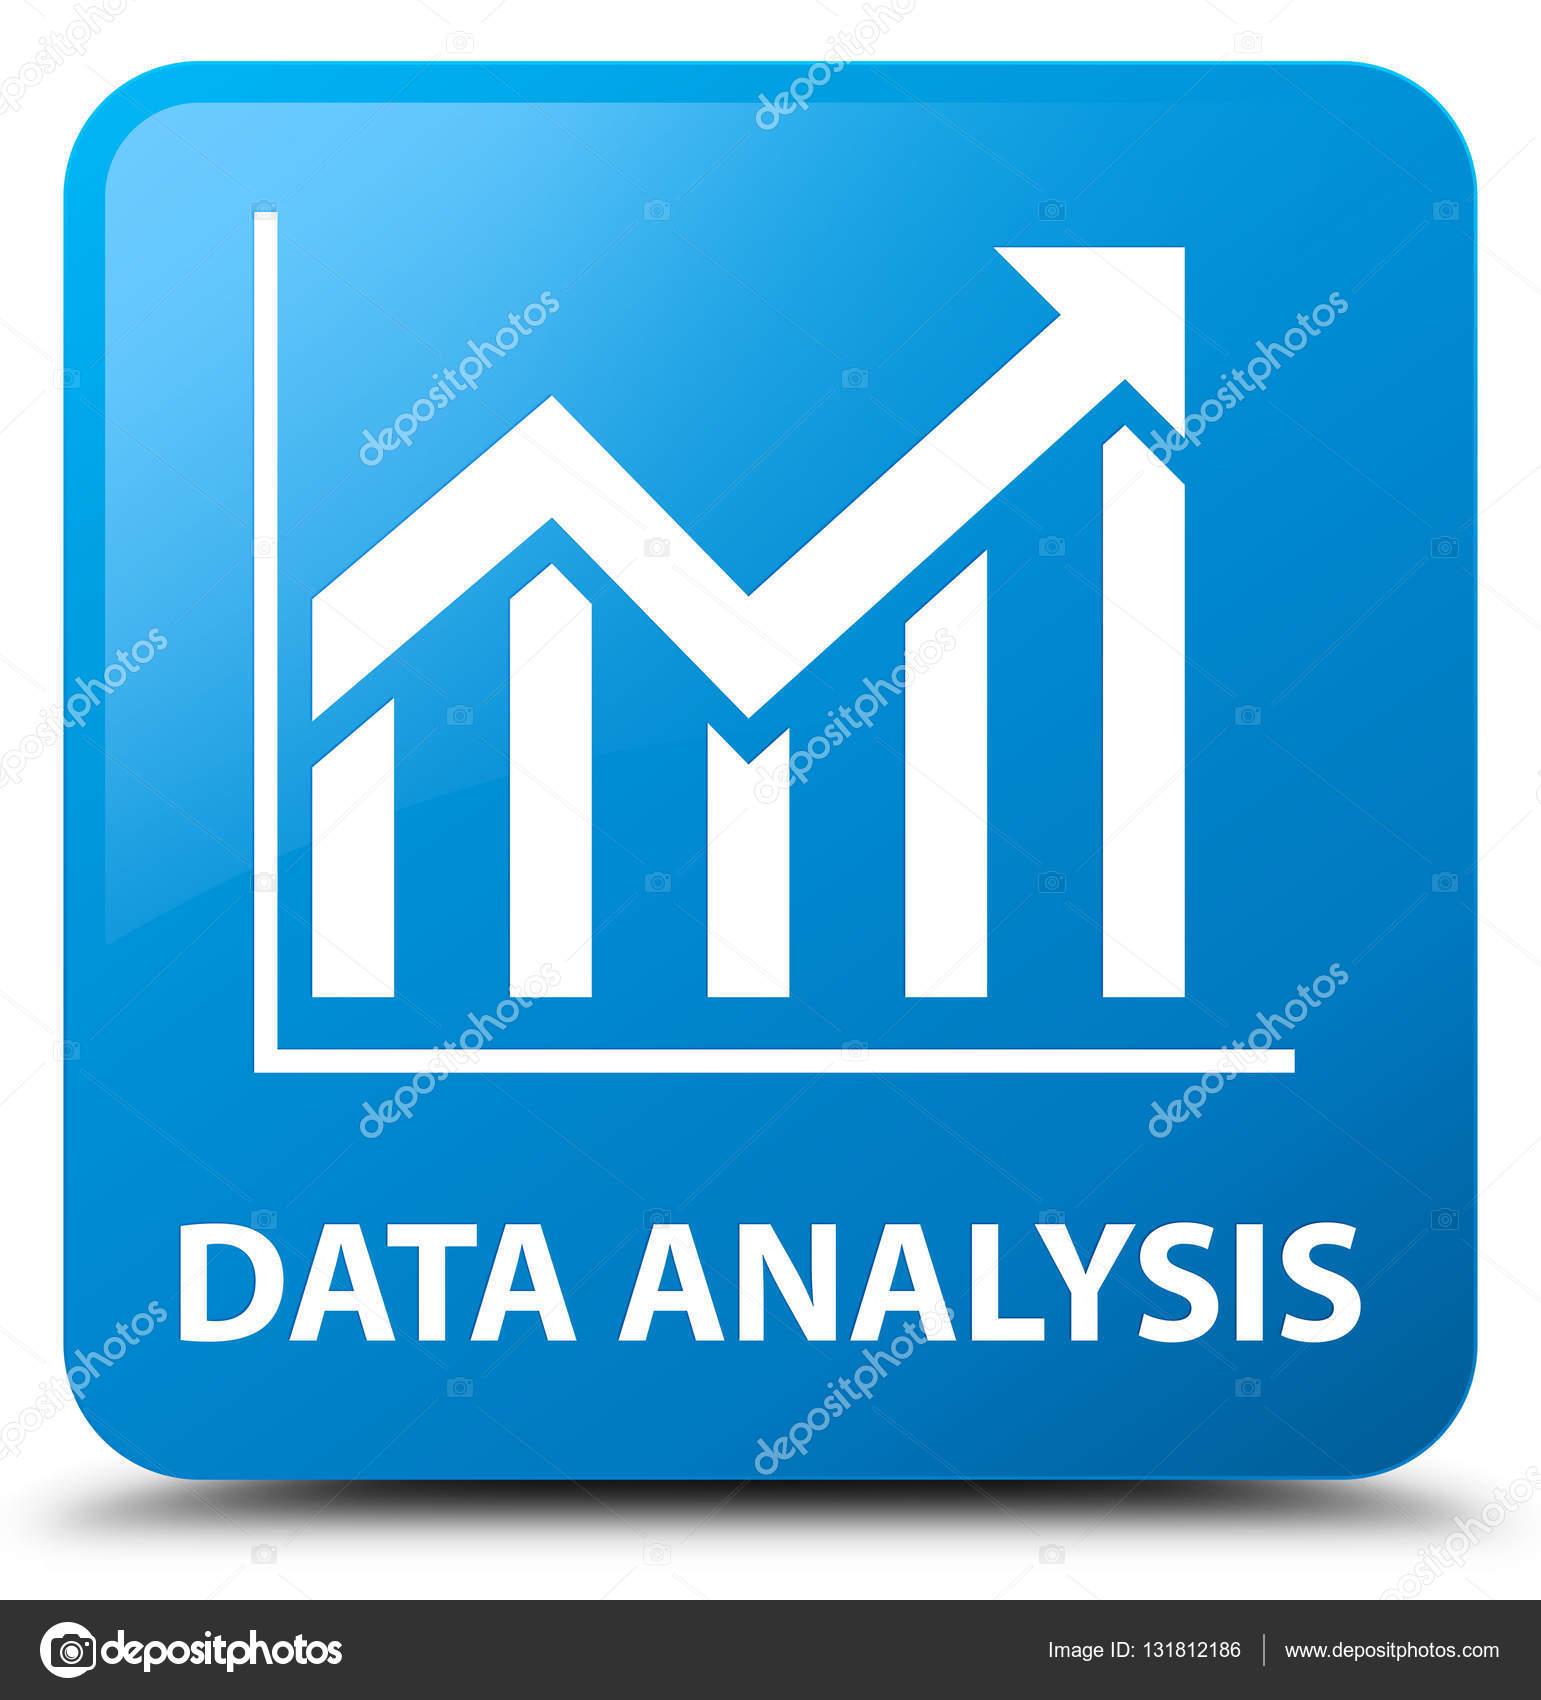 Data analysis (statistics icon) cyan blue square button